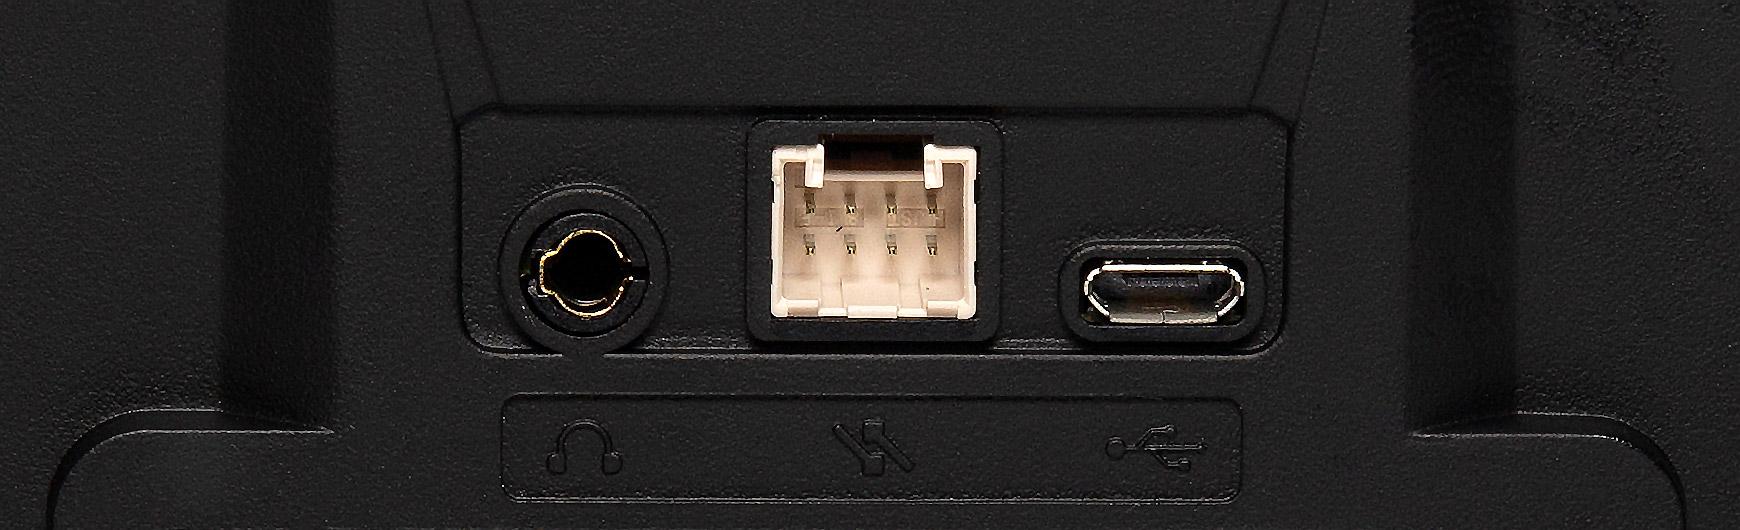 USB AND AUDIO JACK